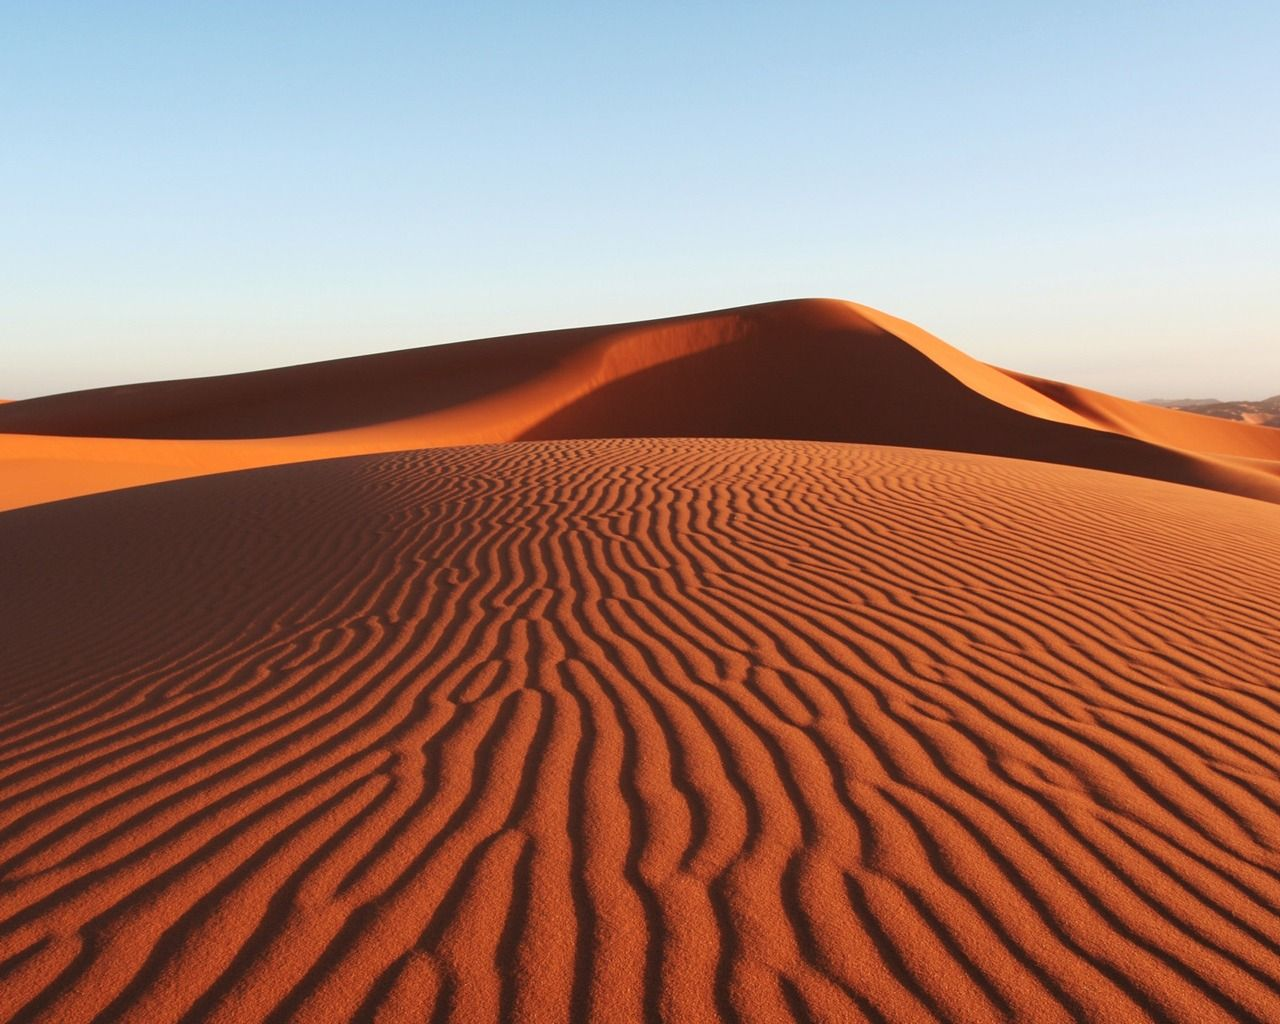 cdn.pcwallart.com images desert-sand-background-wallpaper-2.jpg